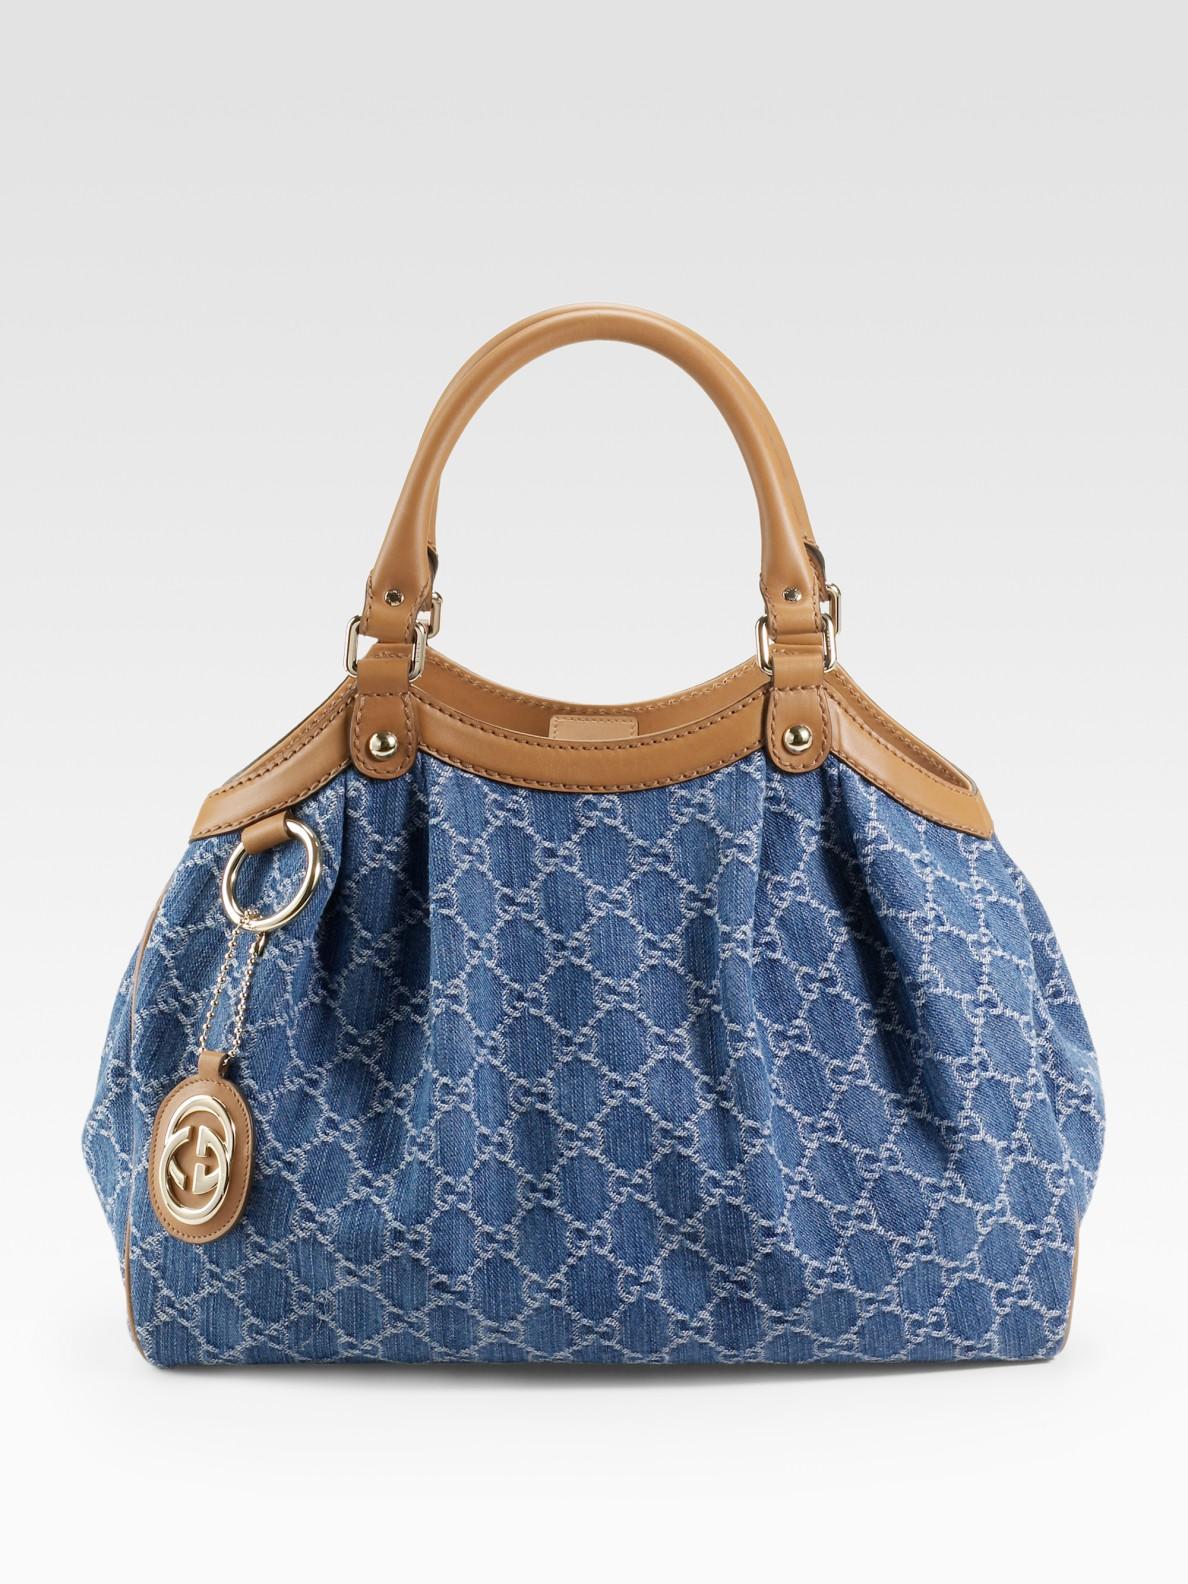 Lyst Gucci Sukey Medium Tote In Blue